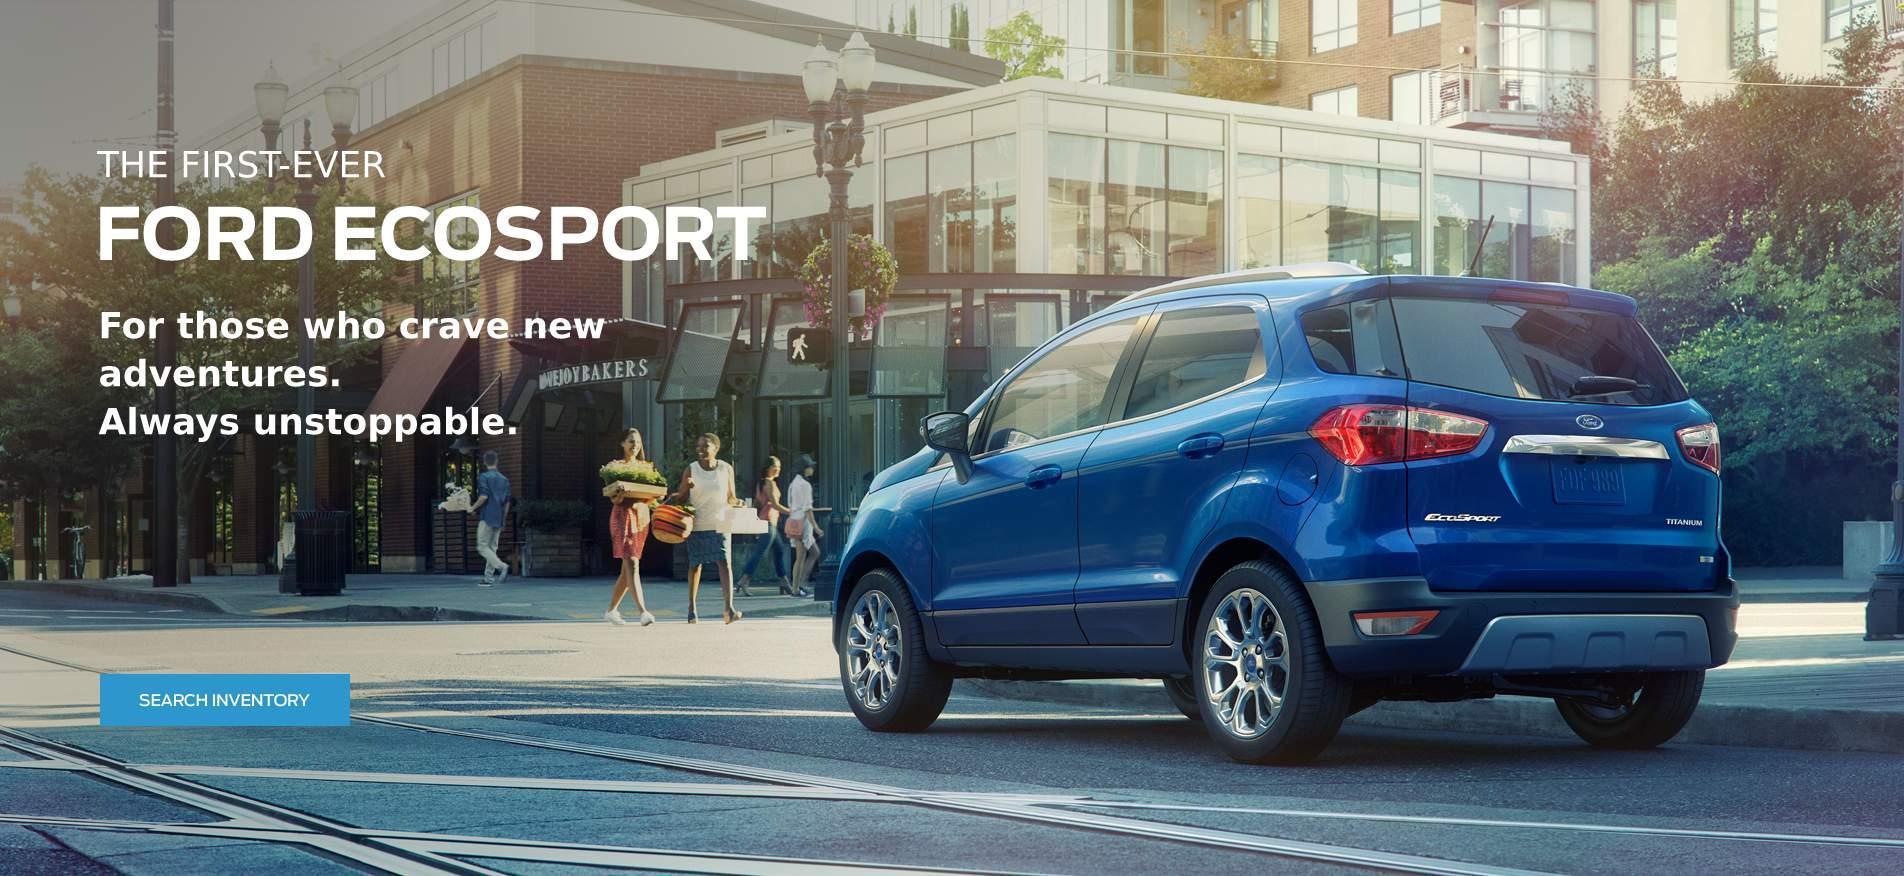 2018 EcoSport Glenoak Ford Westshore Victoria